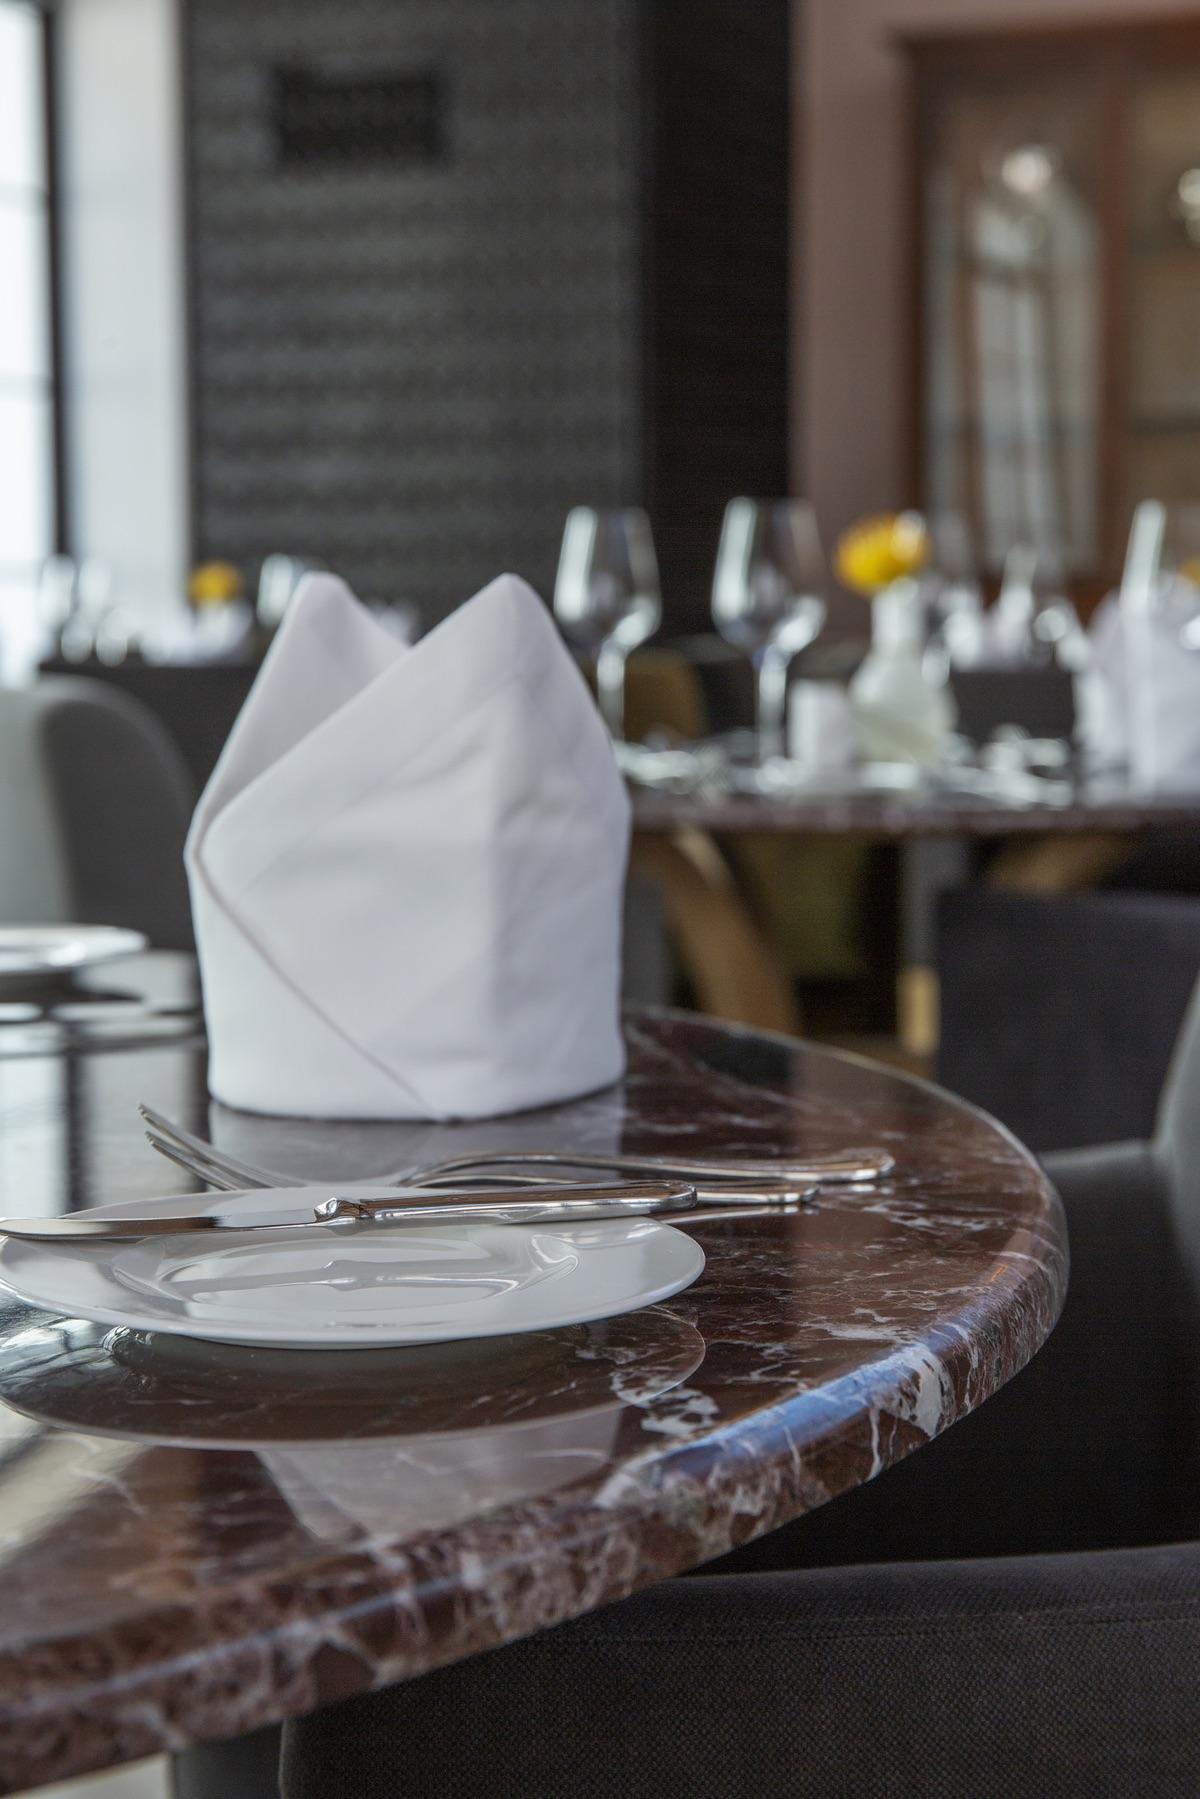 Artmar-MARBLE-SLABS_Bespoke-Project_Custom-table-tops-for-Lanzerac-Hotel-Restaurant_Rosso-Levanto-Marble.jpg